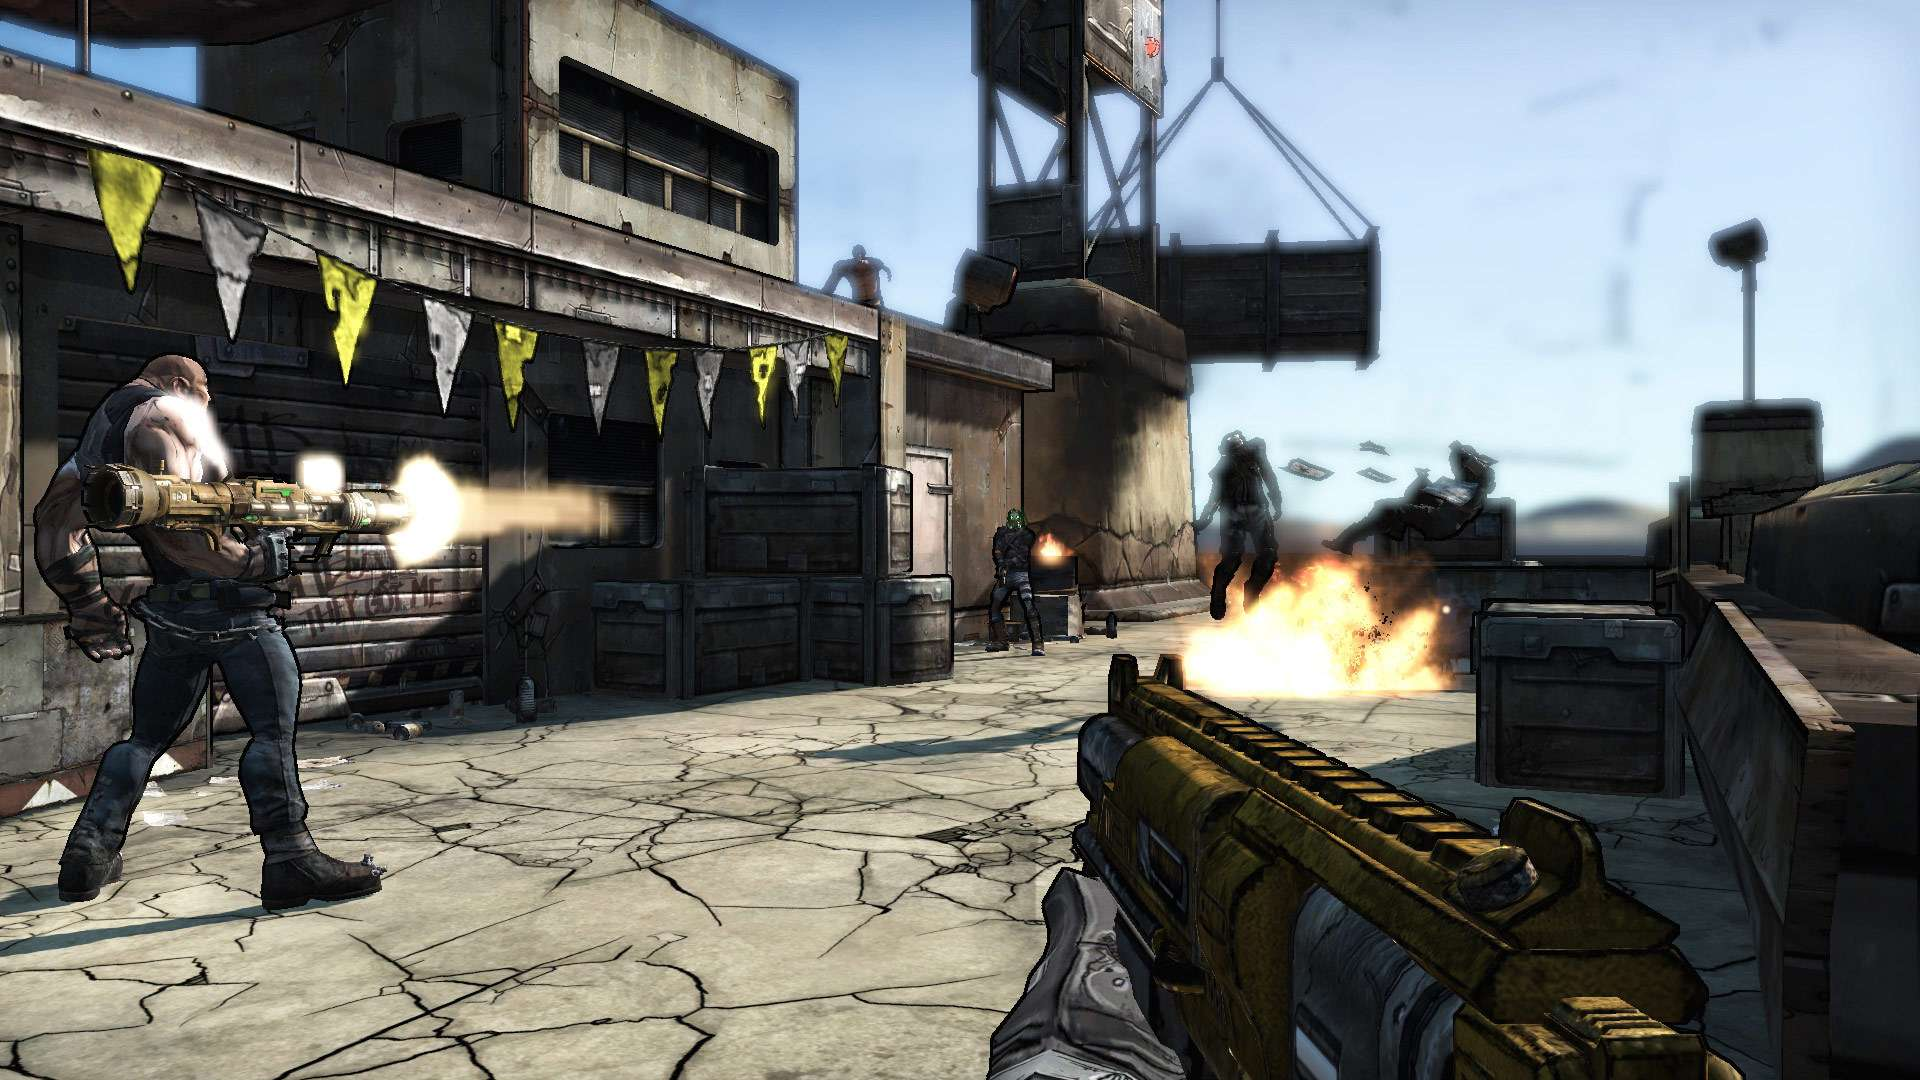 Screenshot from Borderlands (9/10)